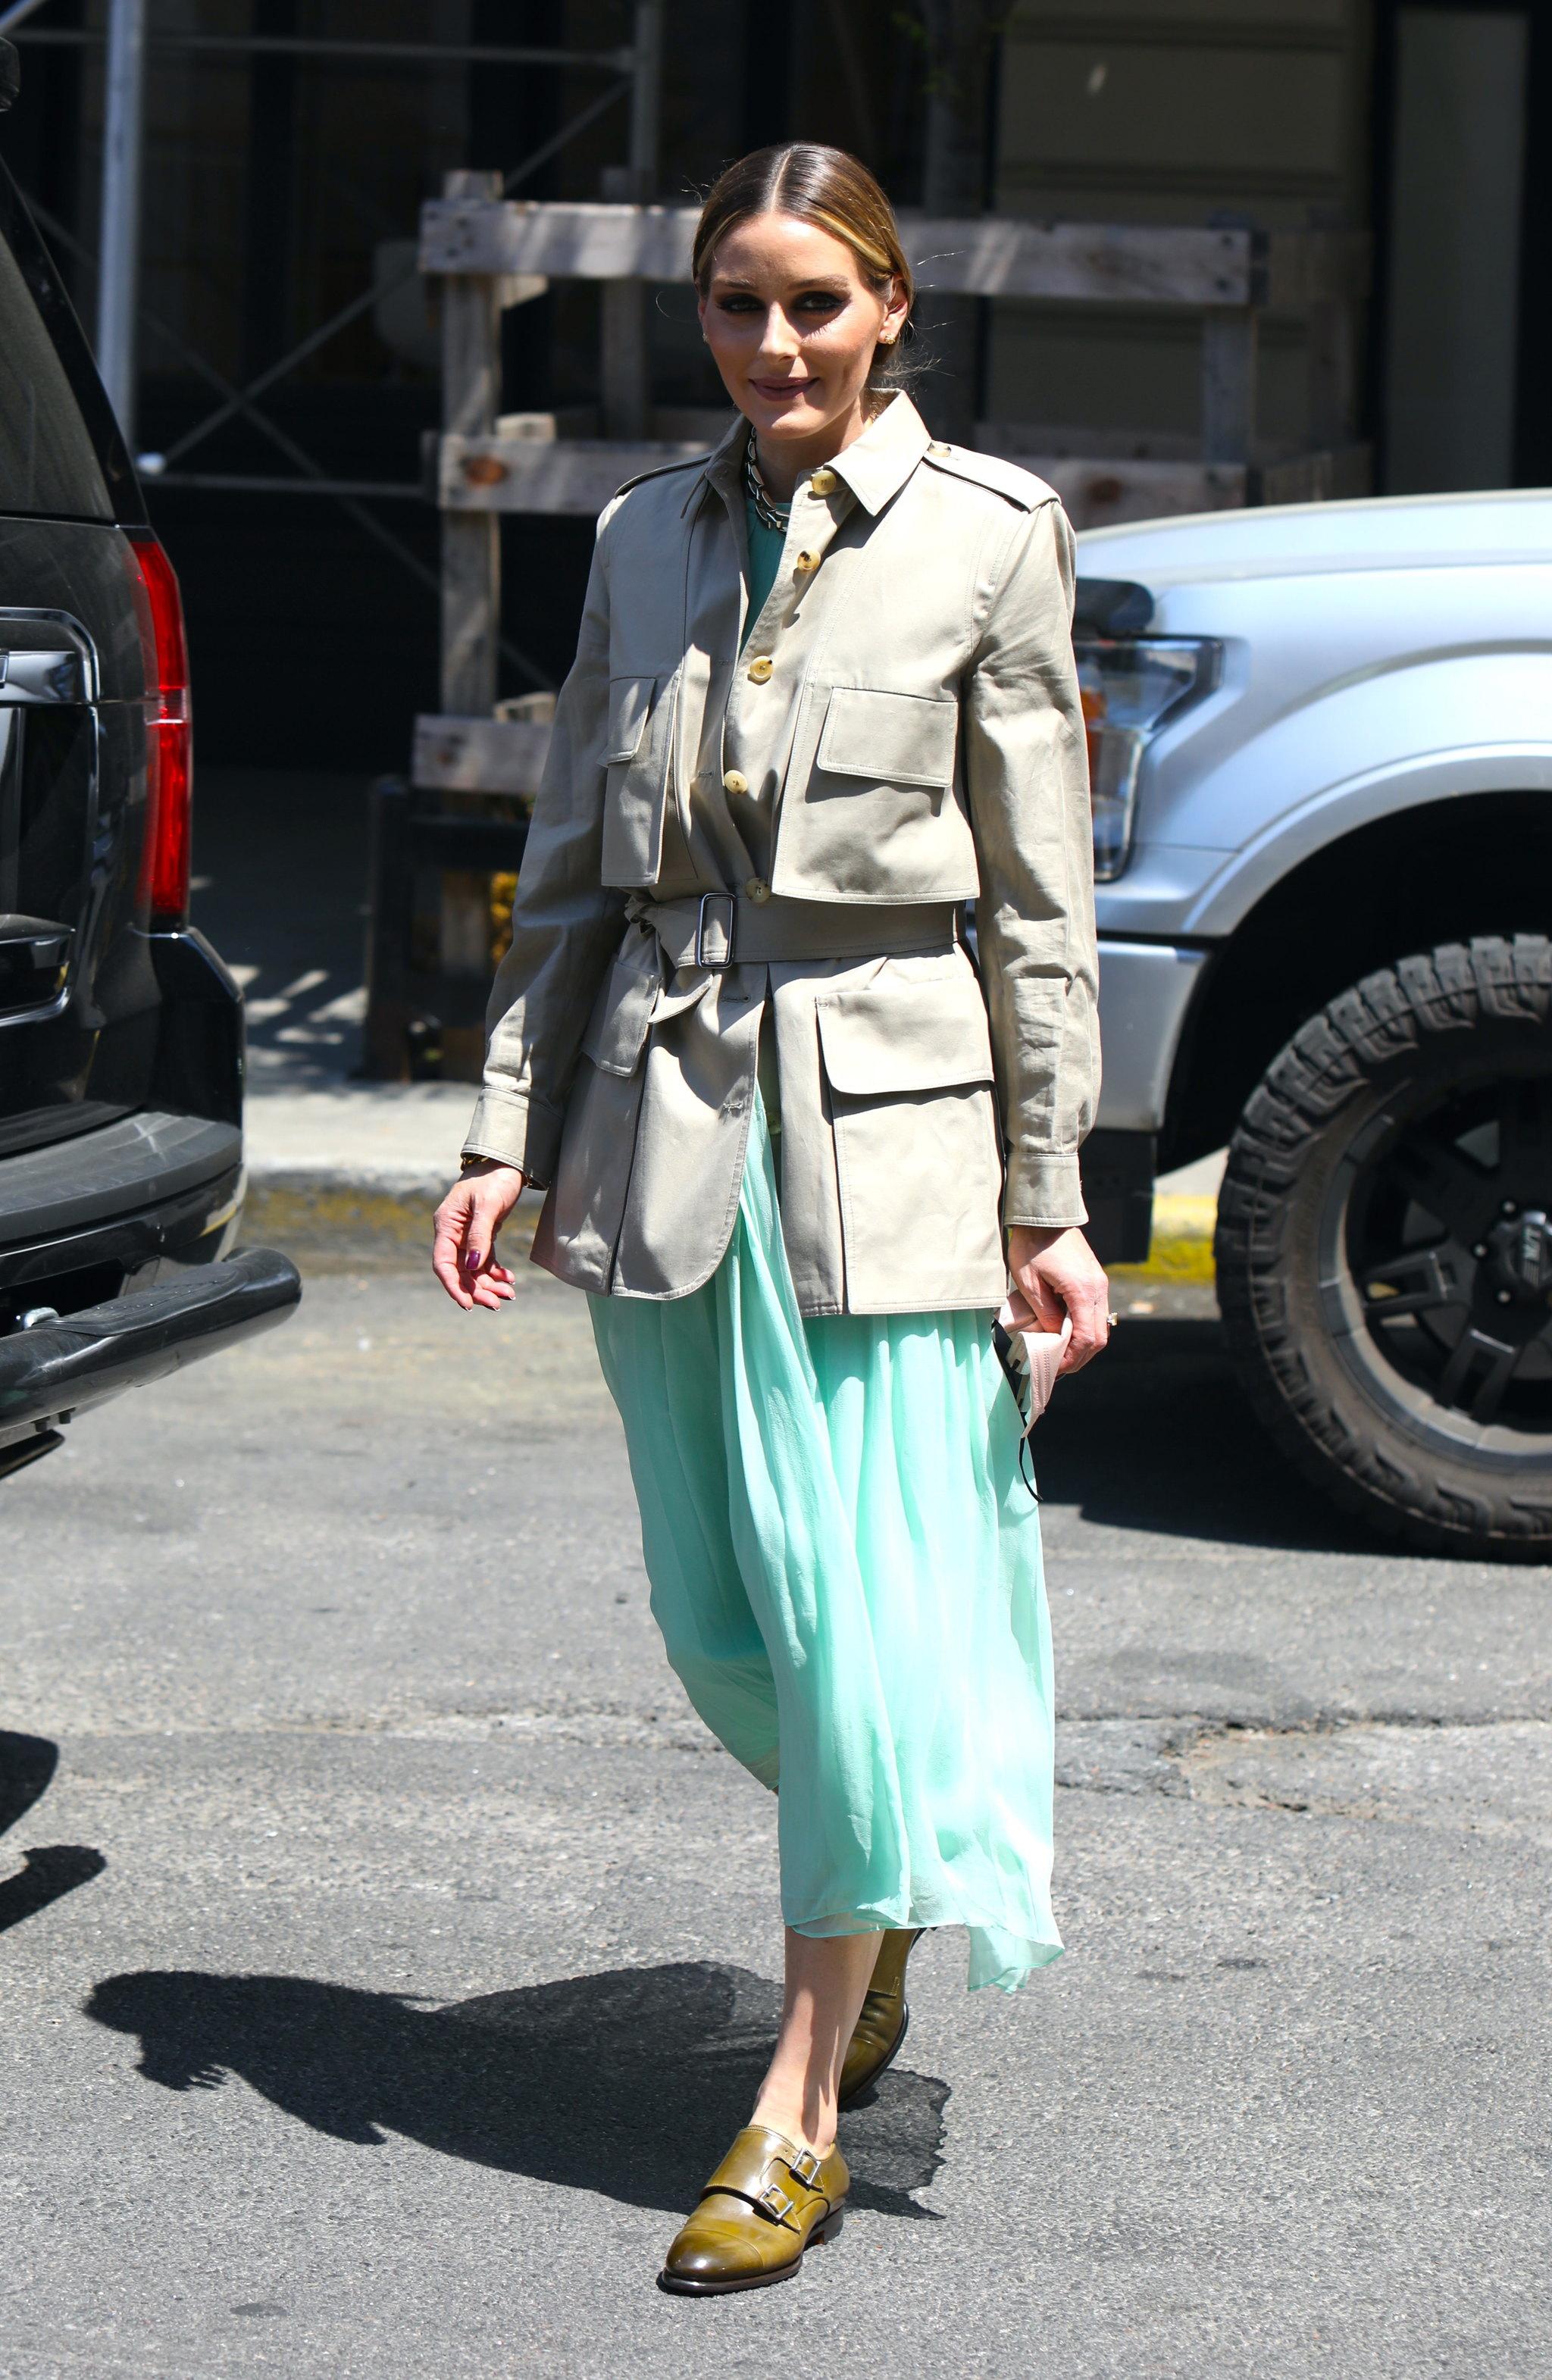 Olivia Palermo con falda midi y chaqueta tipo sahariana